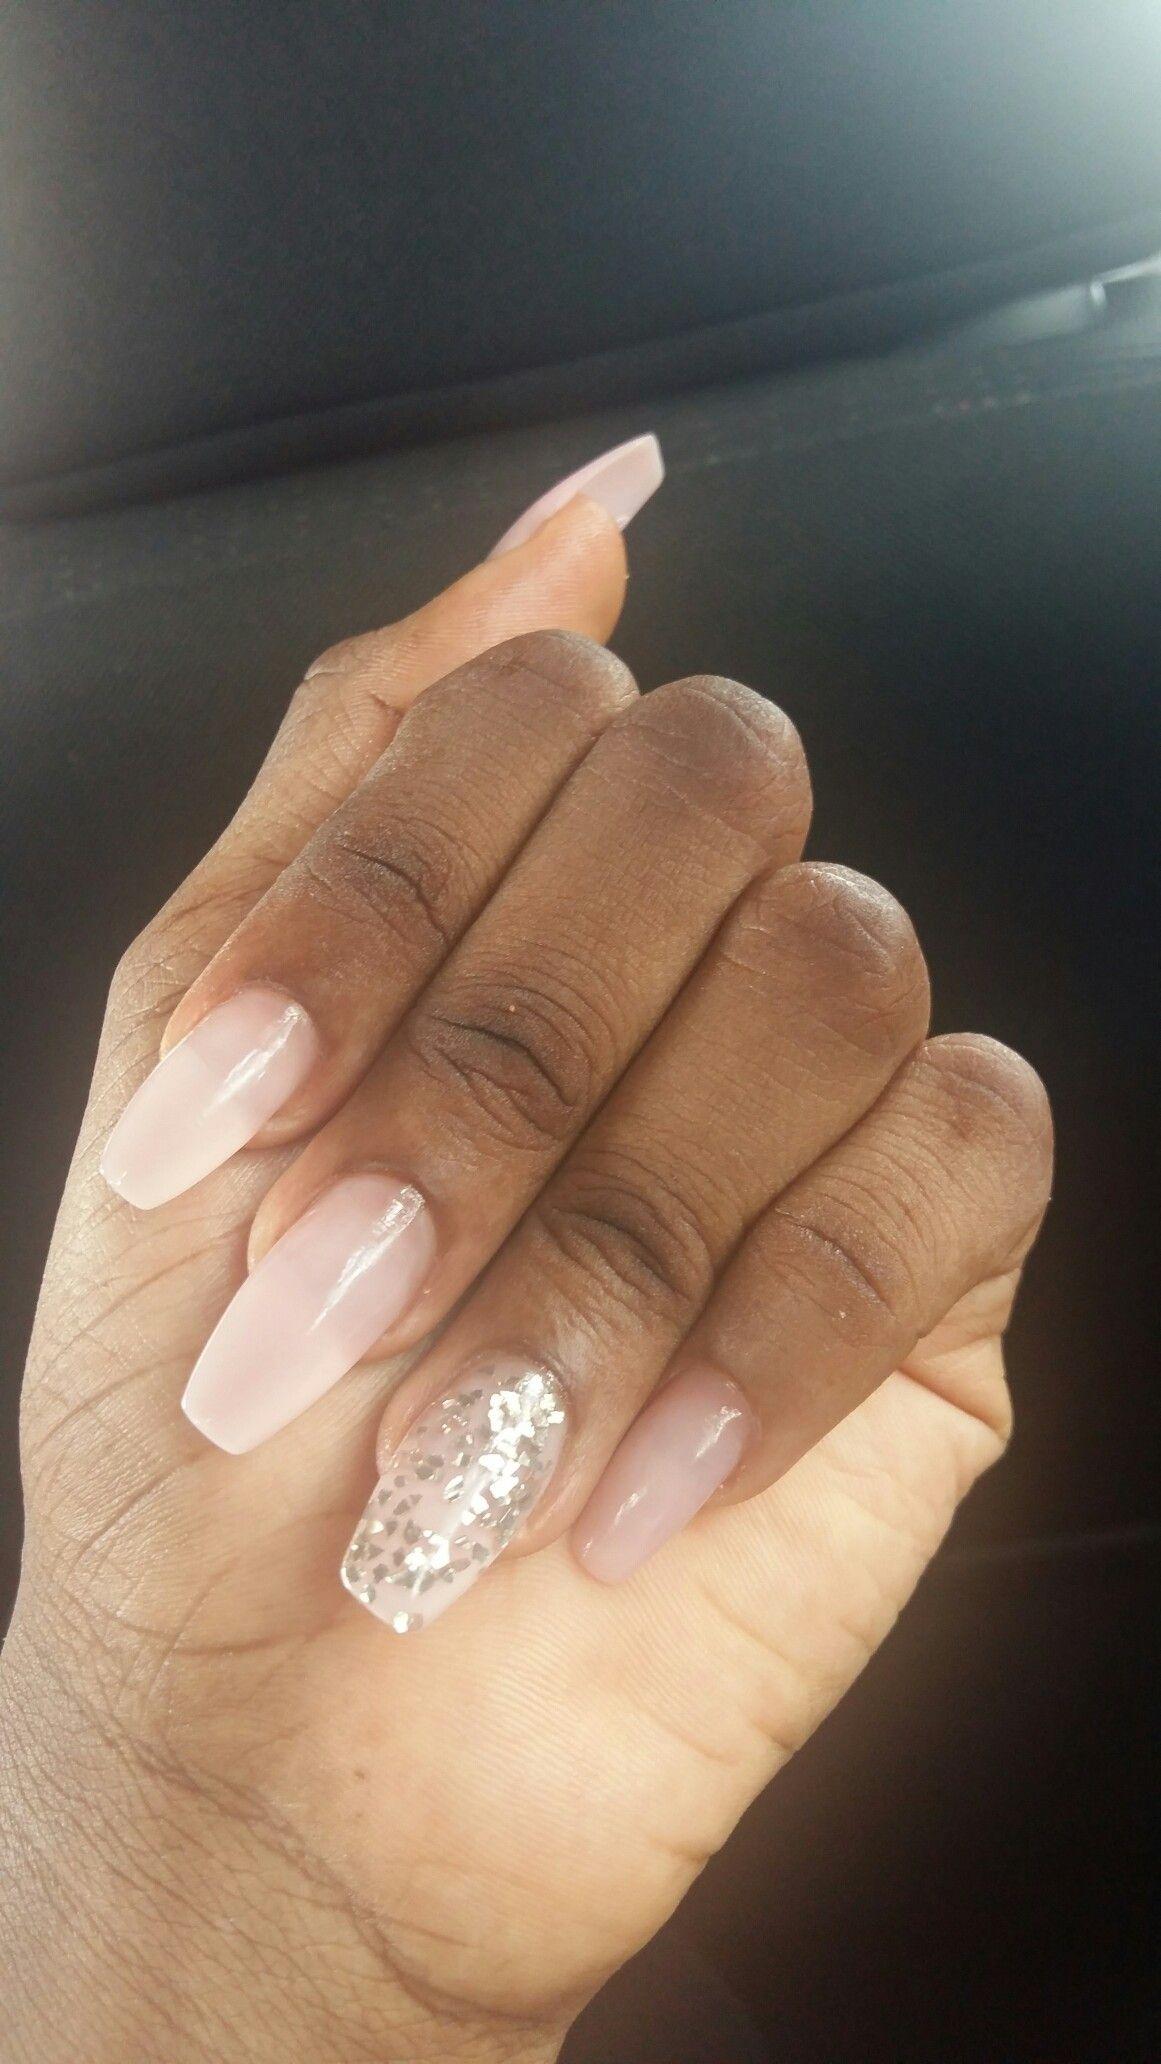 Nails Dark Skin Pink Glitter Acrylics Pink Nails Dark Nails Baby Pink Nails